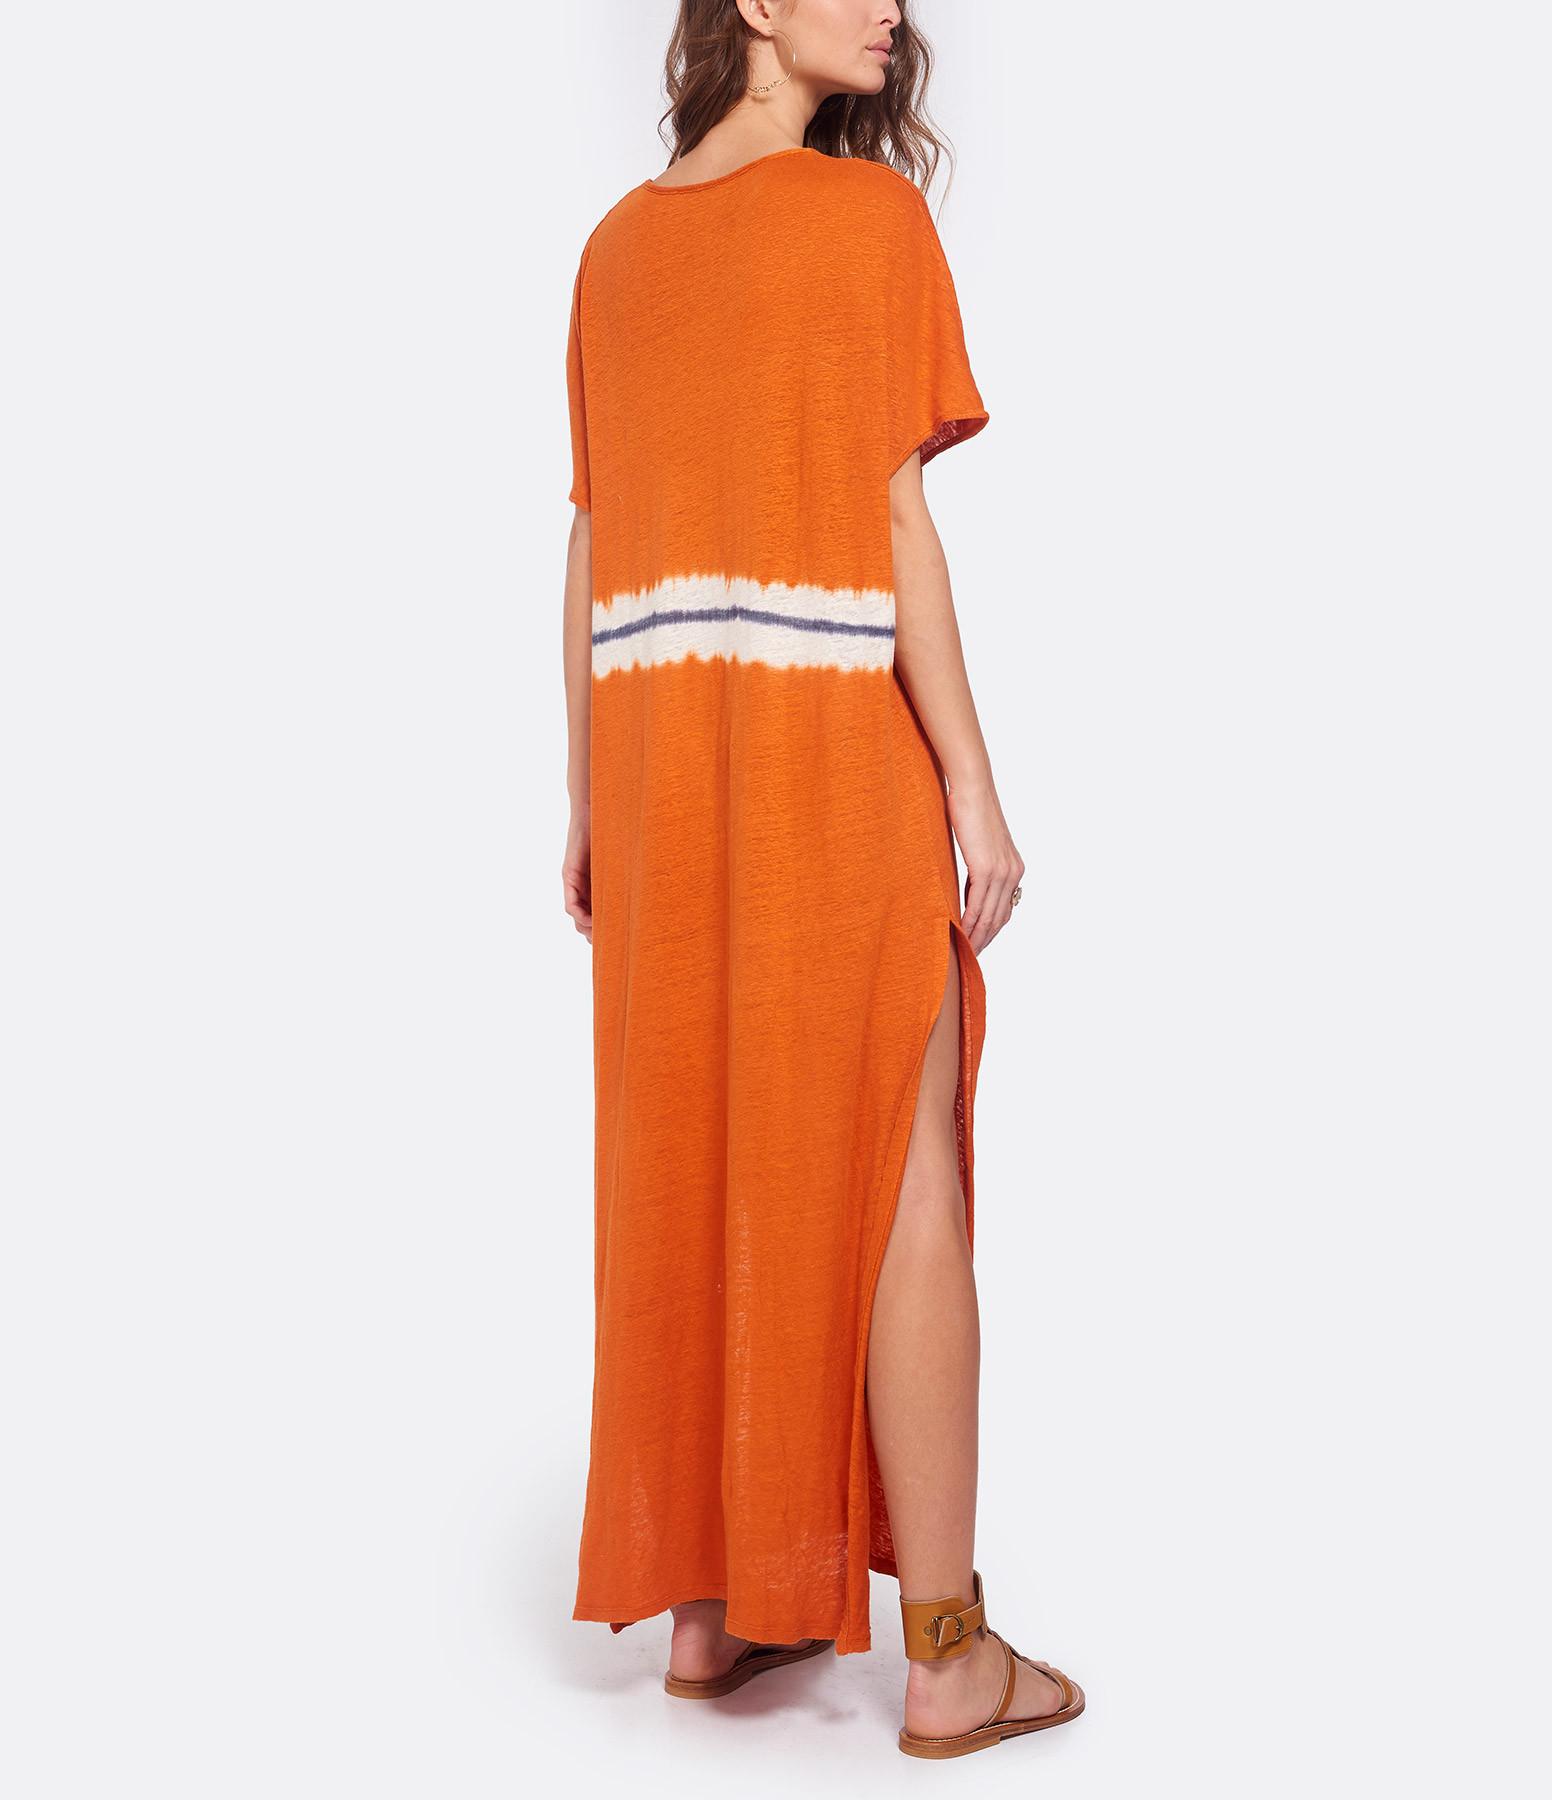 MAJESTIC FILATURES - Robe Tie & Dye Lin Orange Epice